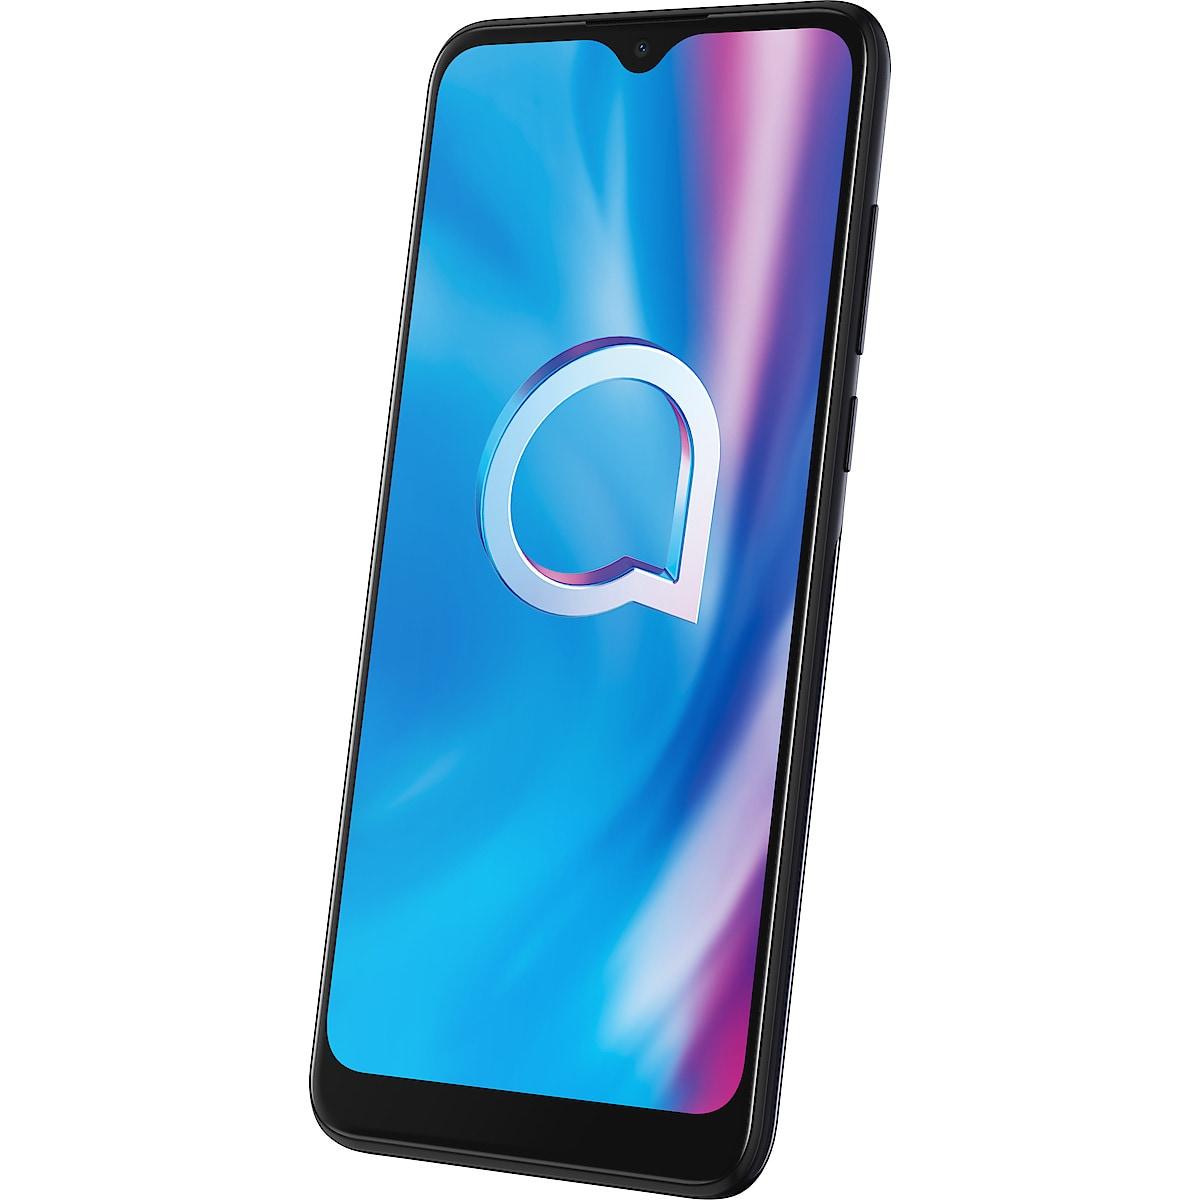 Mobiltelefon Alcatel 1S (2020), 32 GB, Dual SIM Power Gray